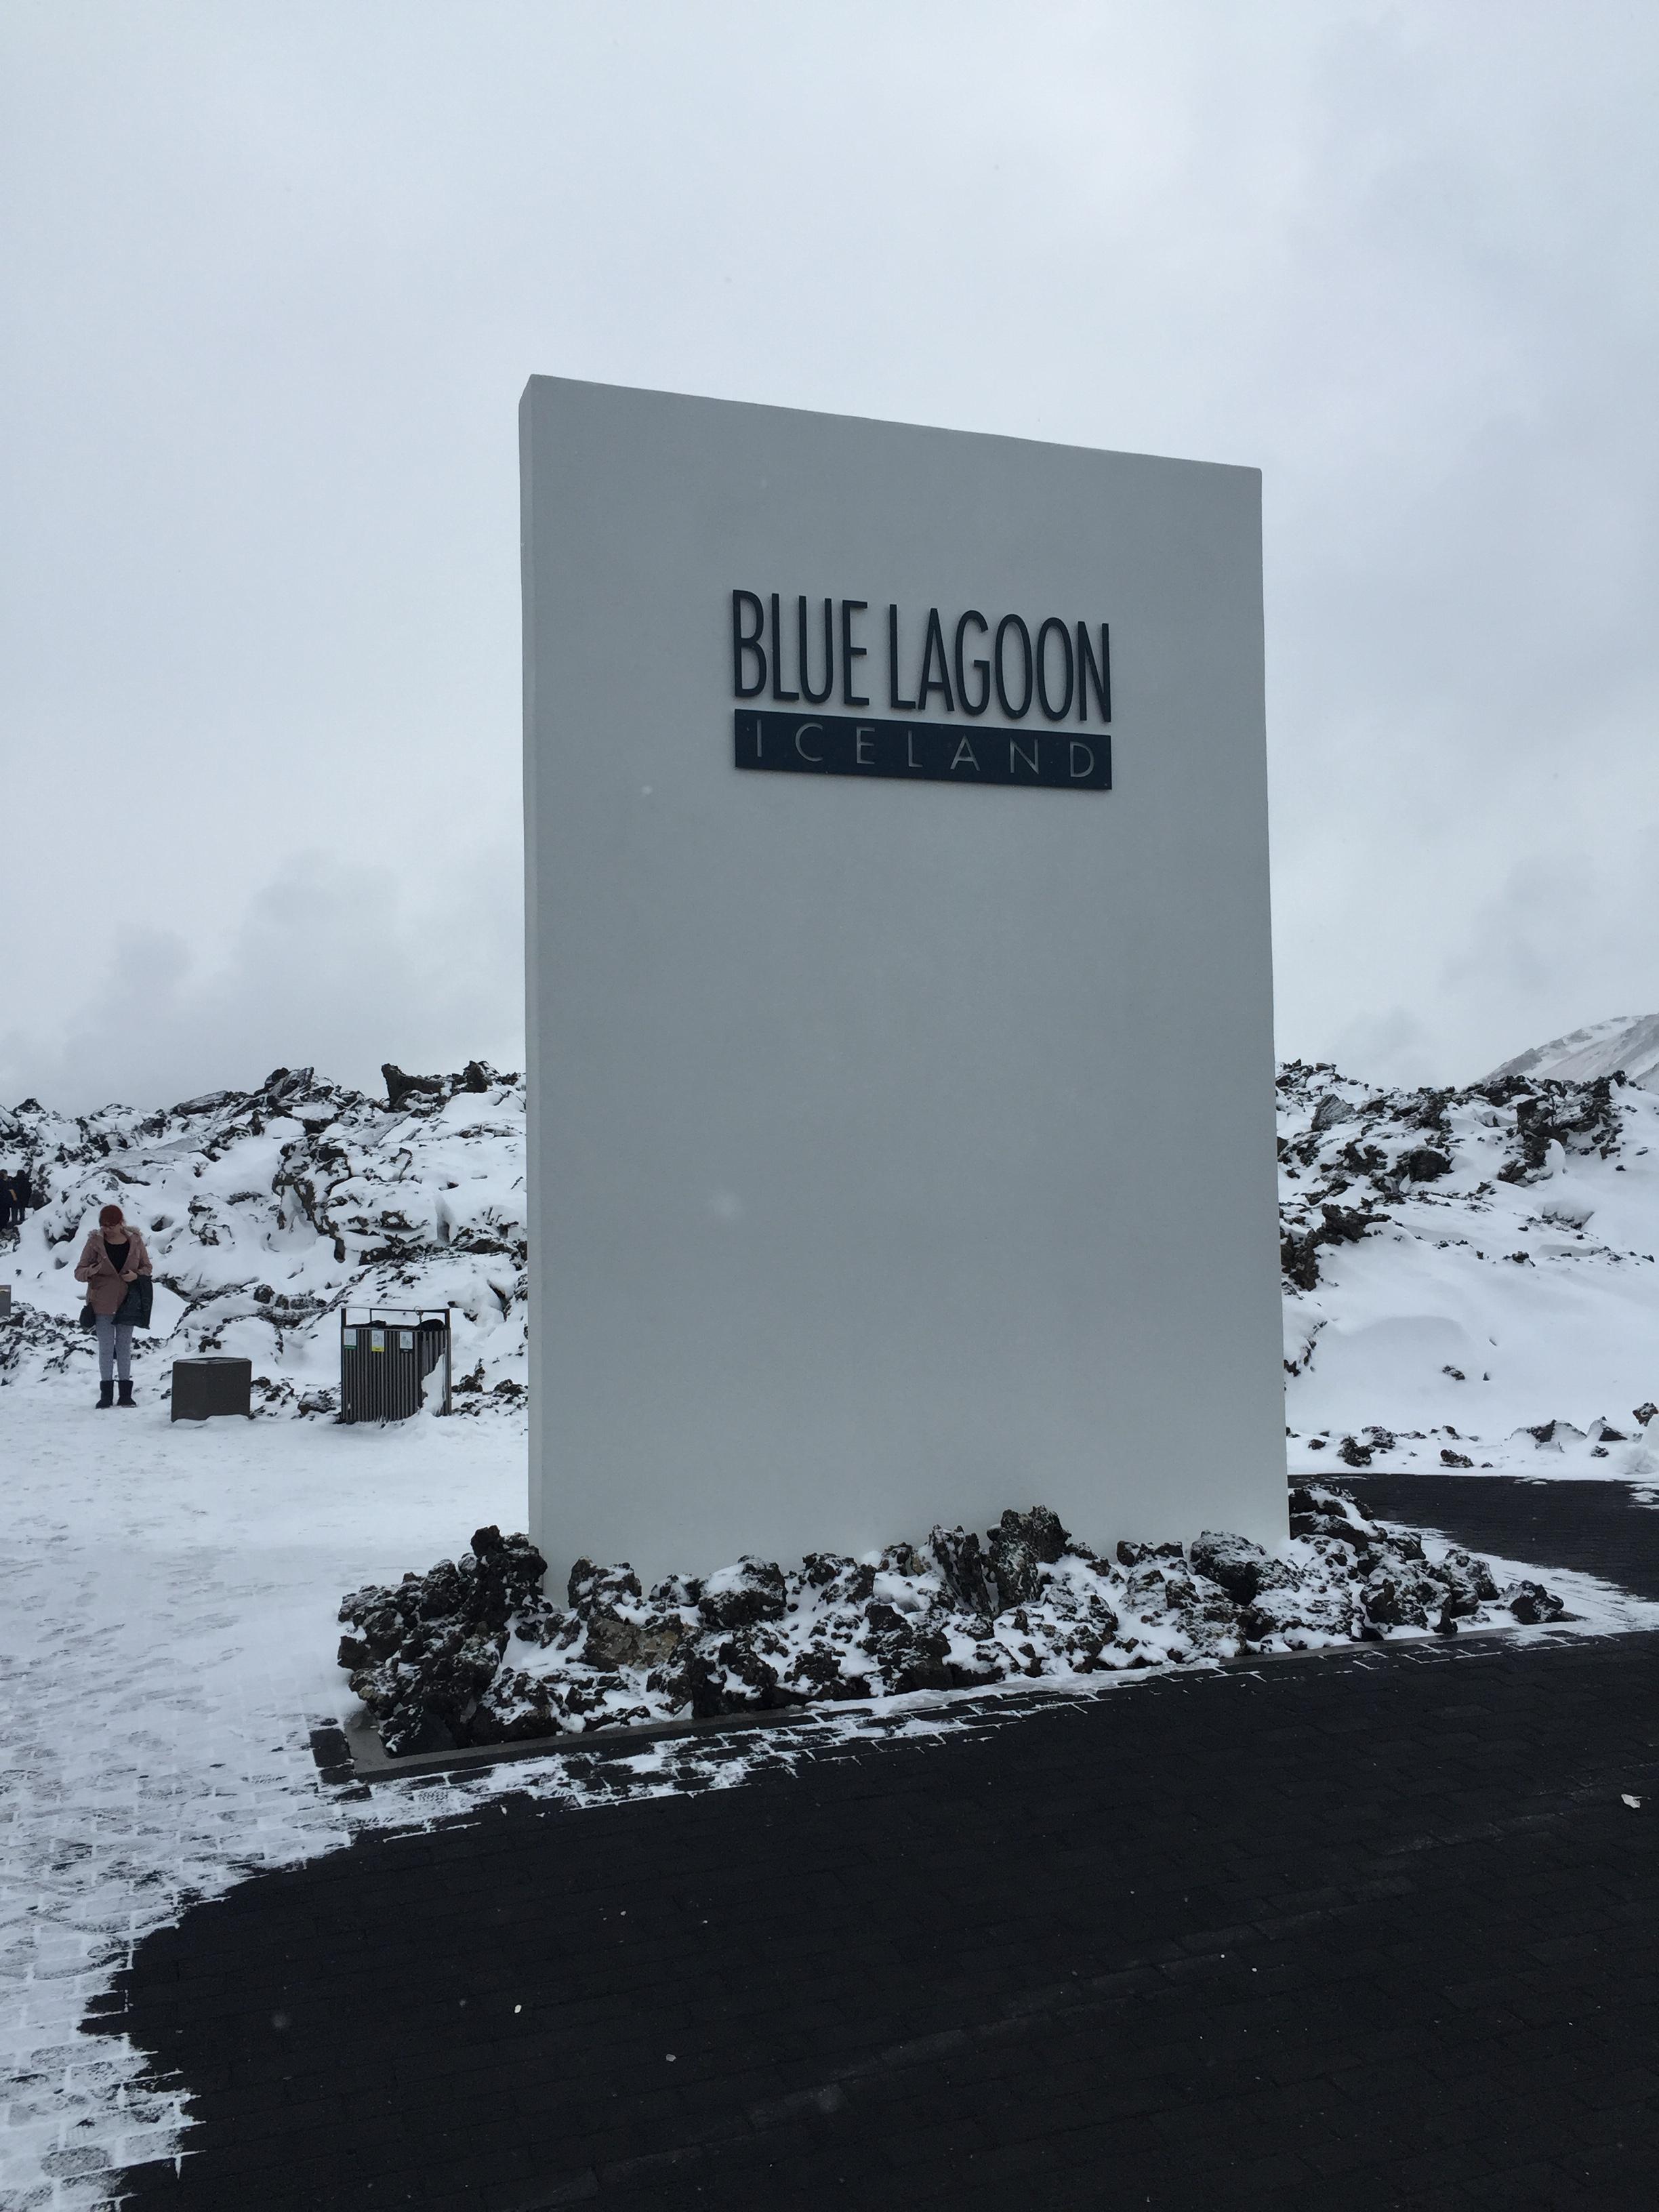 Tag 2 - Reykjavik und Blue Lagoon